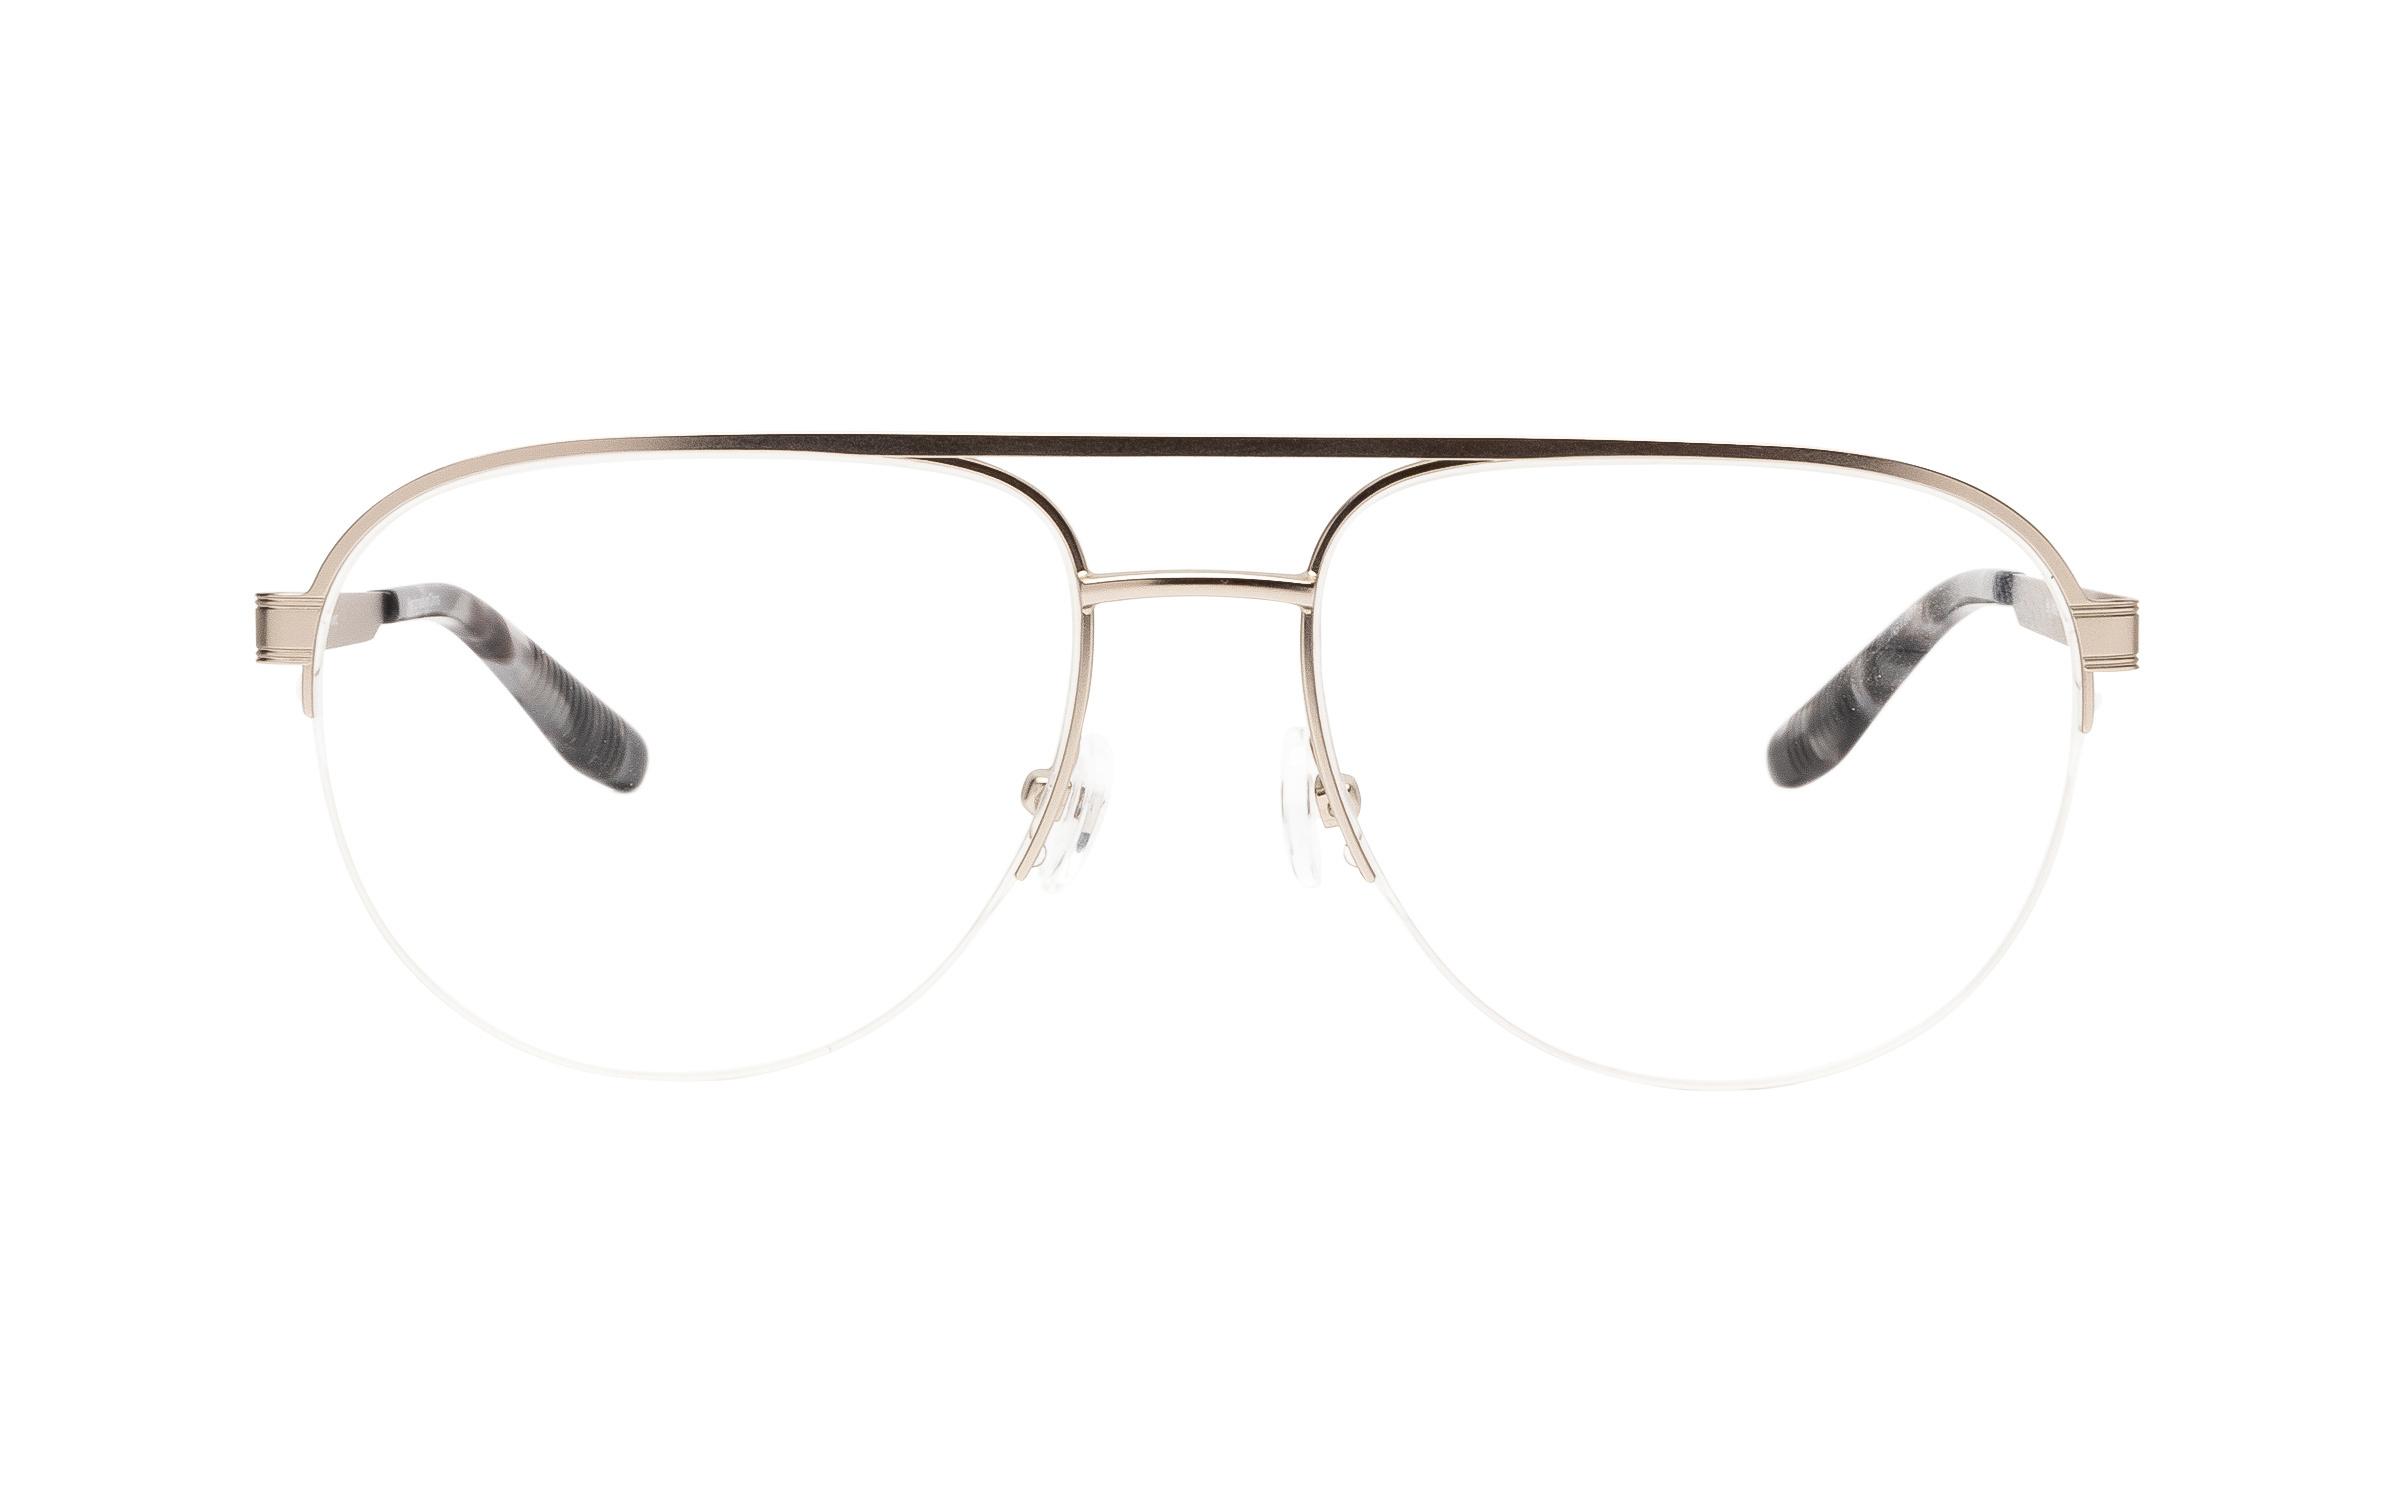 Joseph Marc Bell (54) Eyeglasses and Frame in Matte Silver | Metal - Online